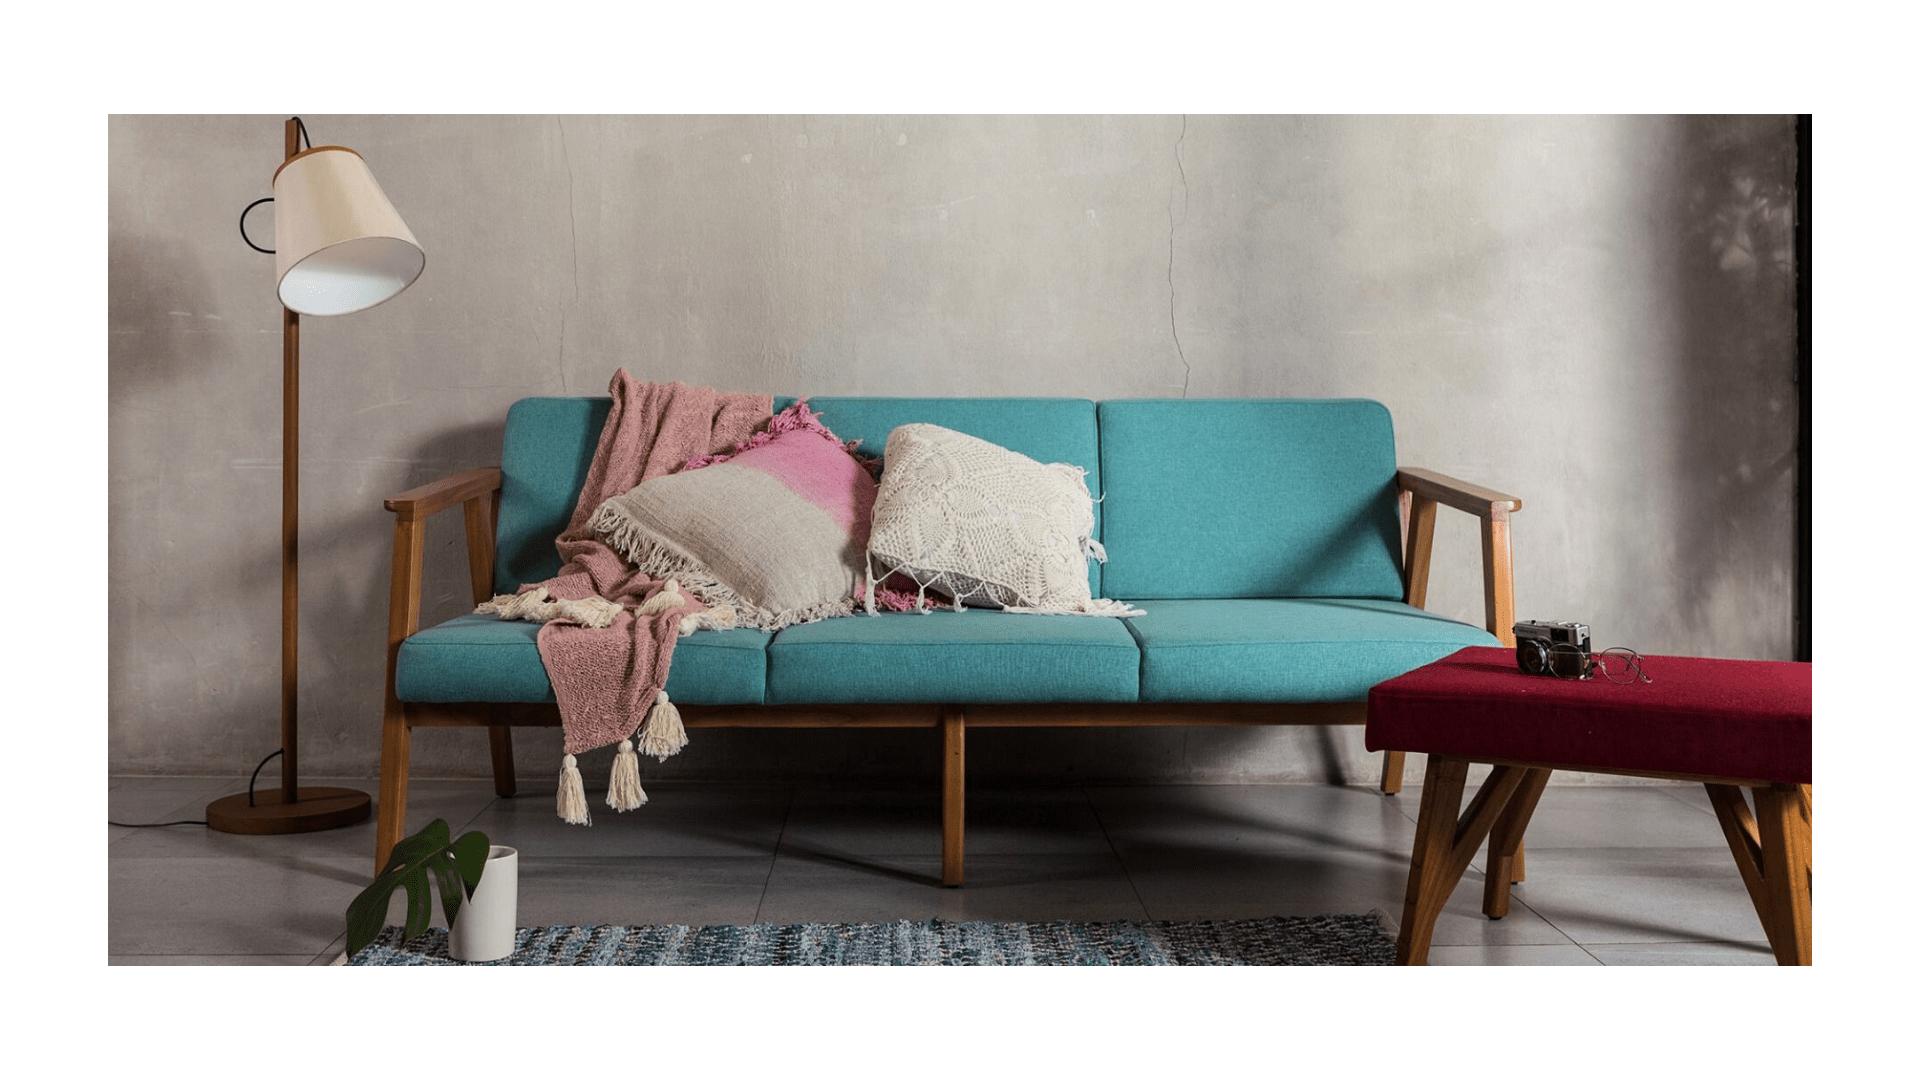 Jual Sofa Minimalis di Jeneponto